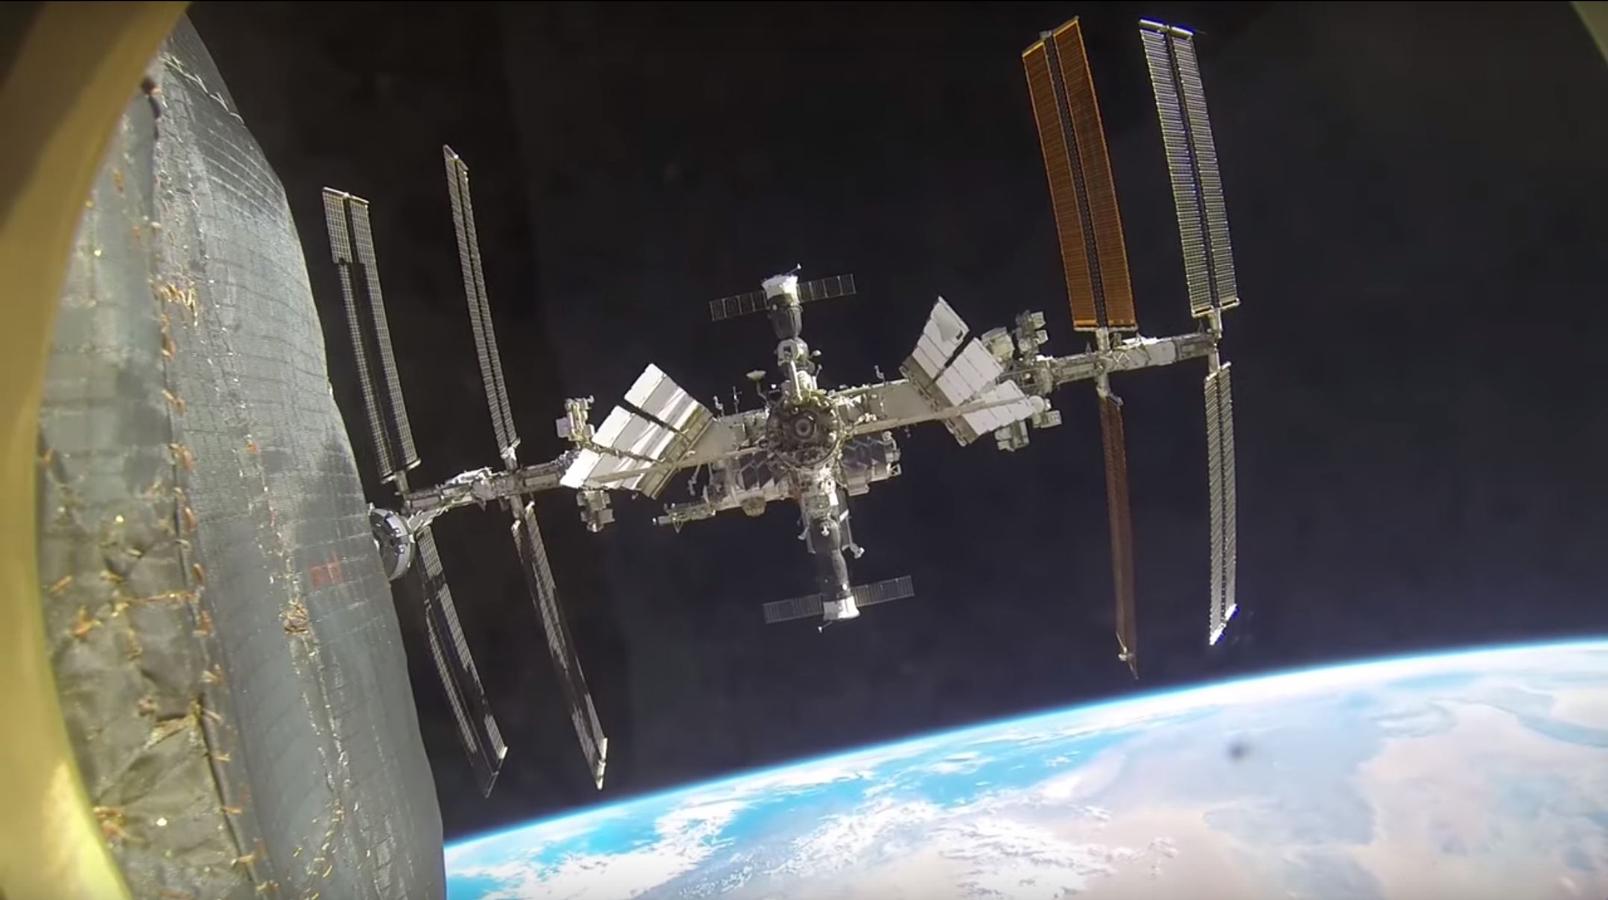 Proxima : Les (petites) péripéties spatiales de Thomas Pesquet